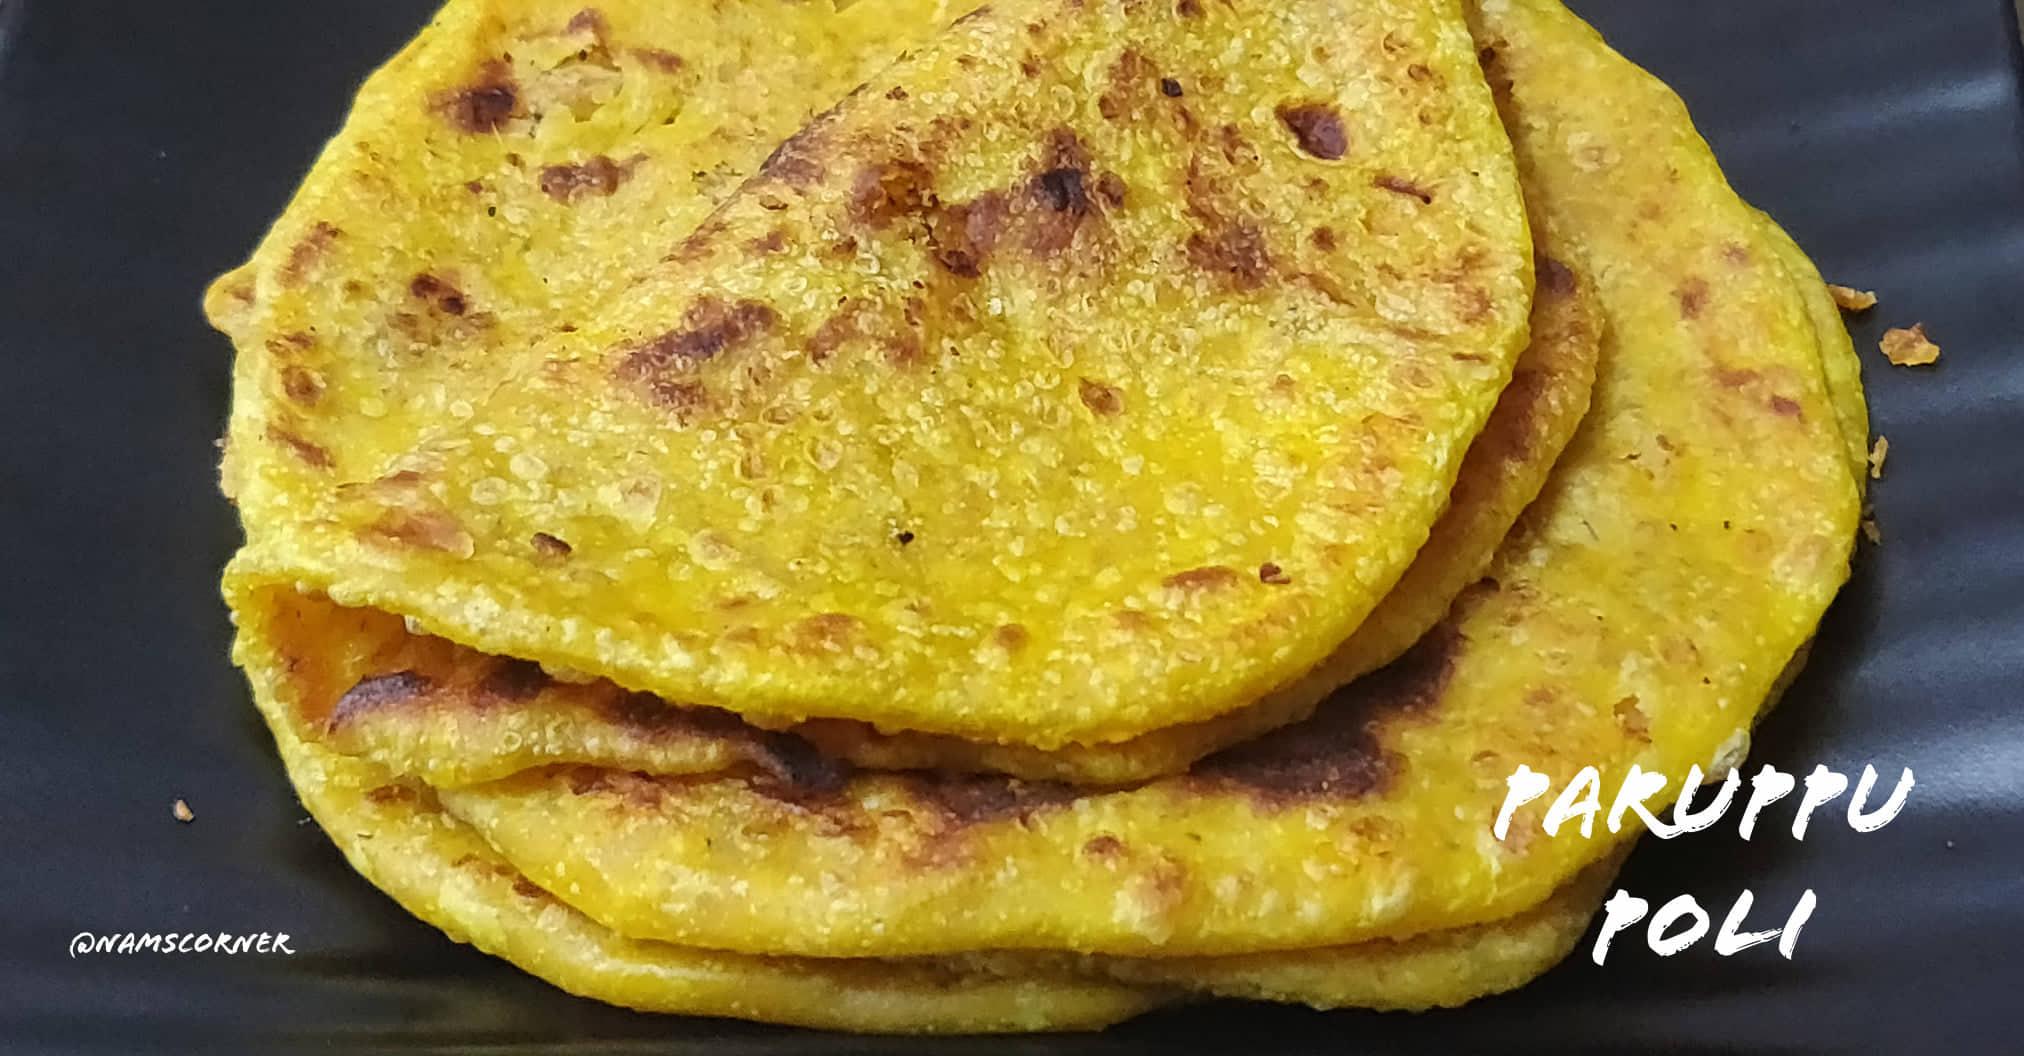 Puran Poli Recipe | Sweet Poli Recipe | Paruppu Poli